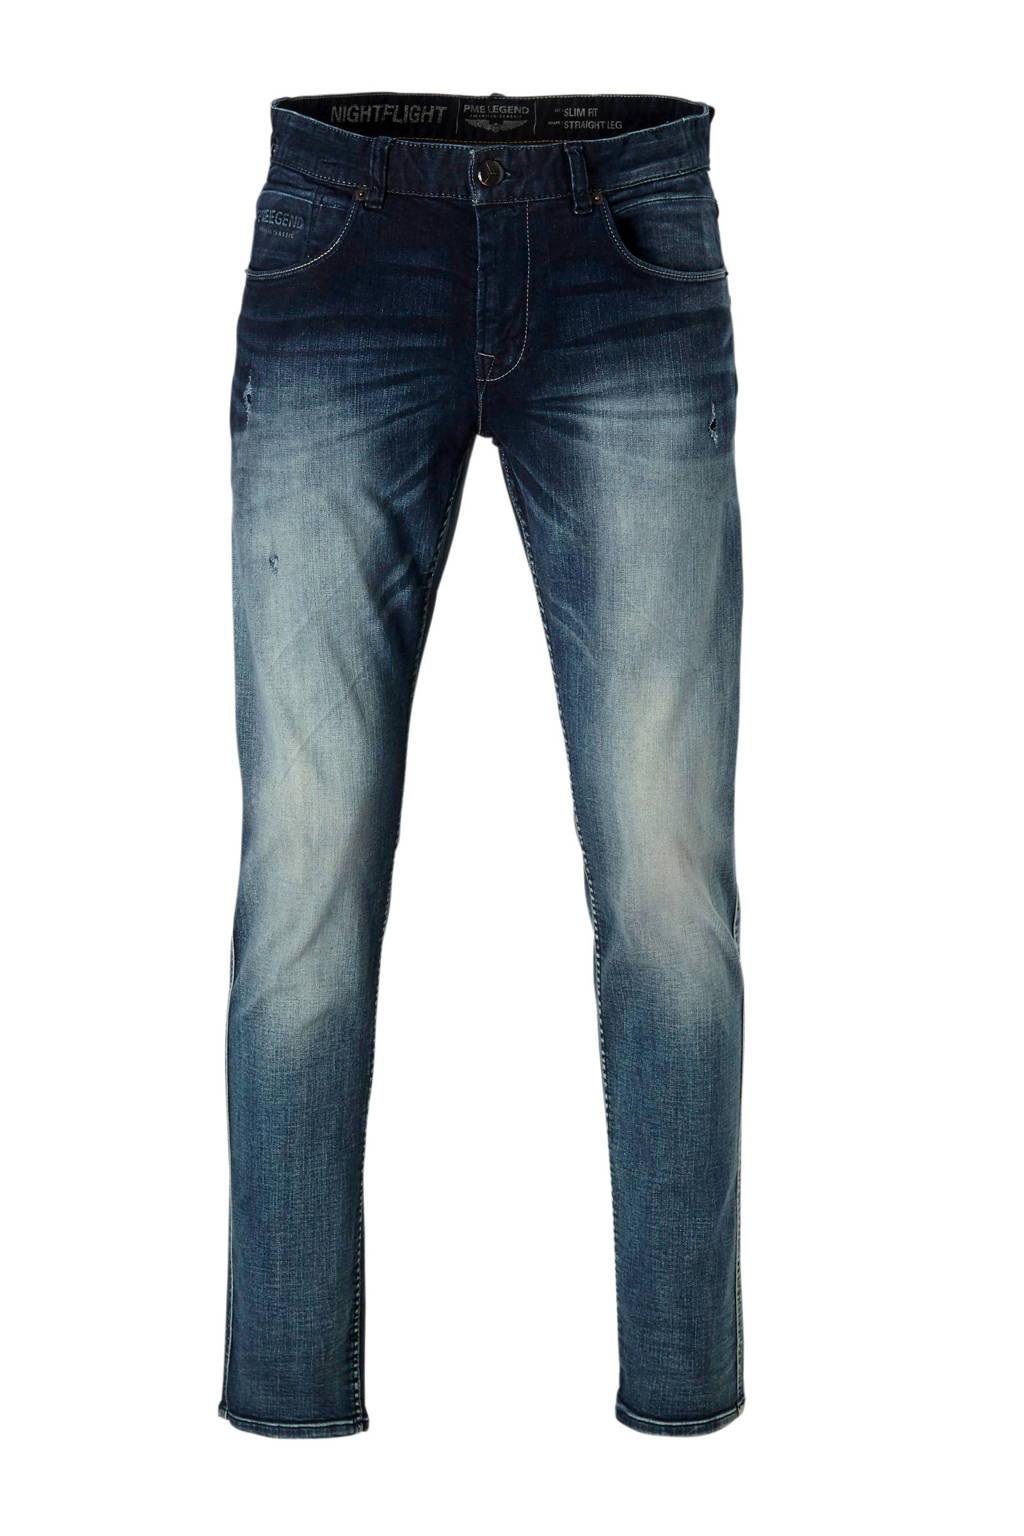 PME Legend slim fit jeans Nightflight, Dark denim